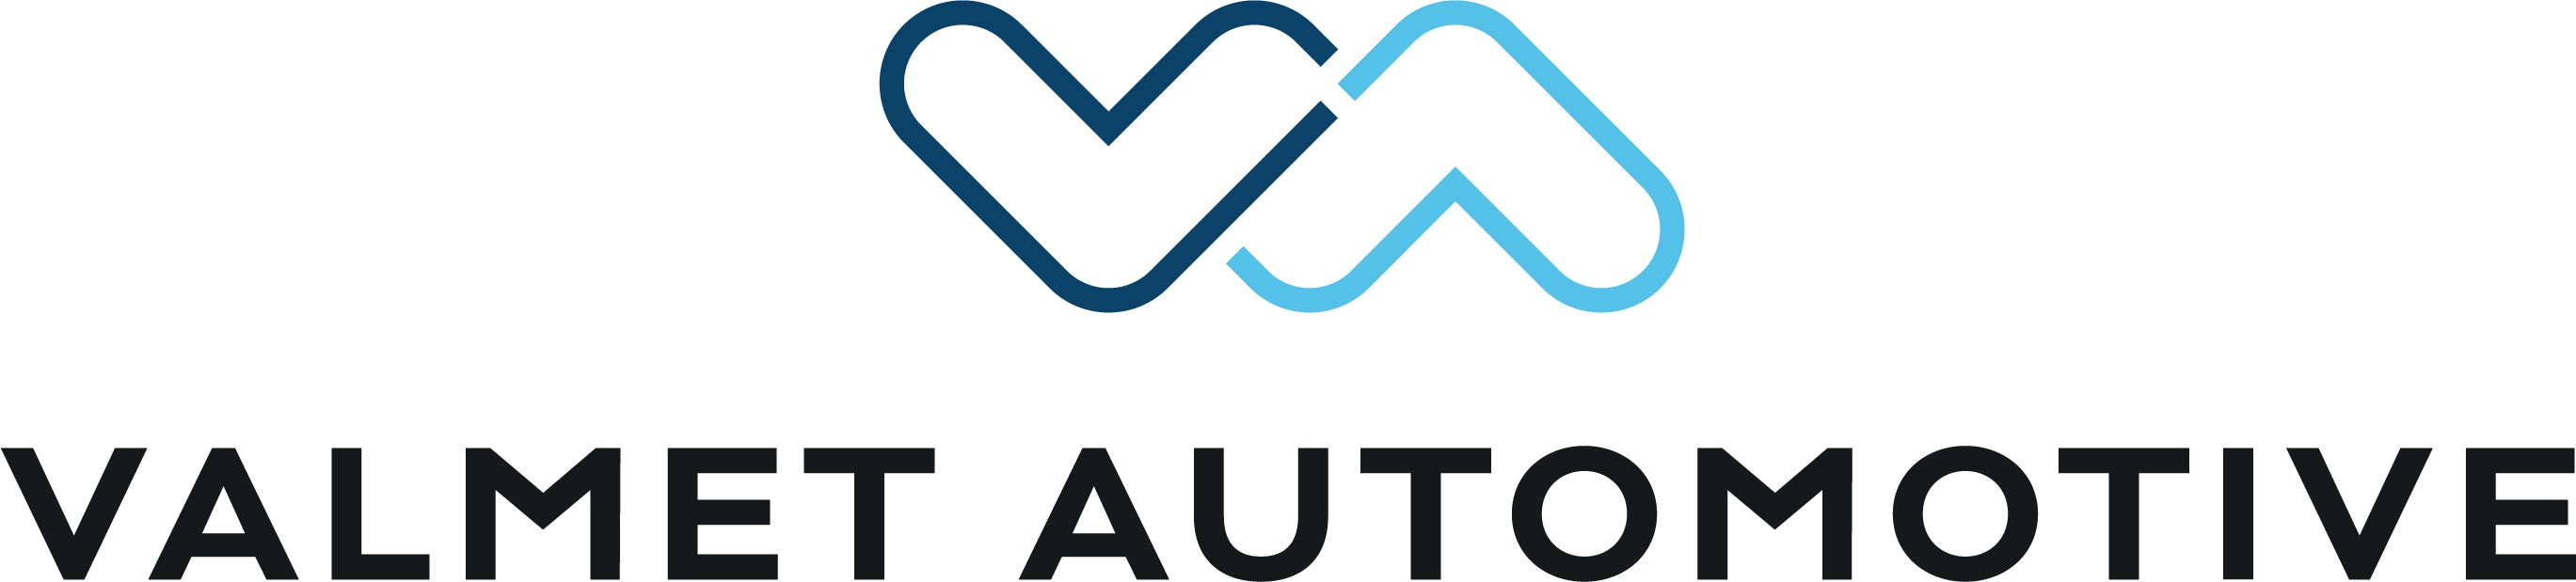 Valmet_Automotive_Logo_Positive_Color